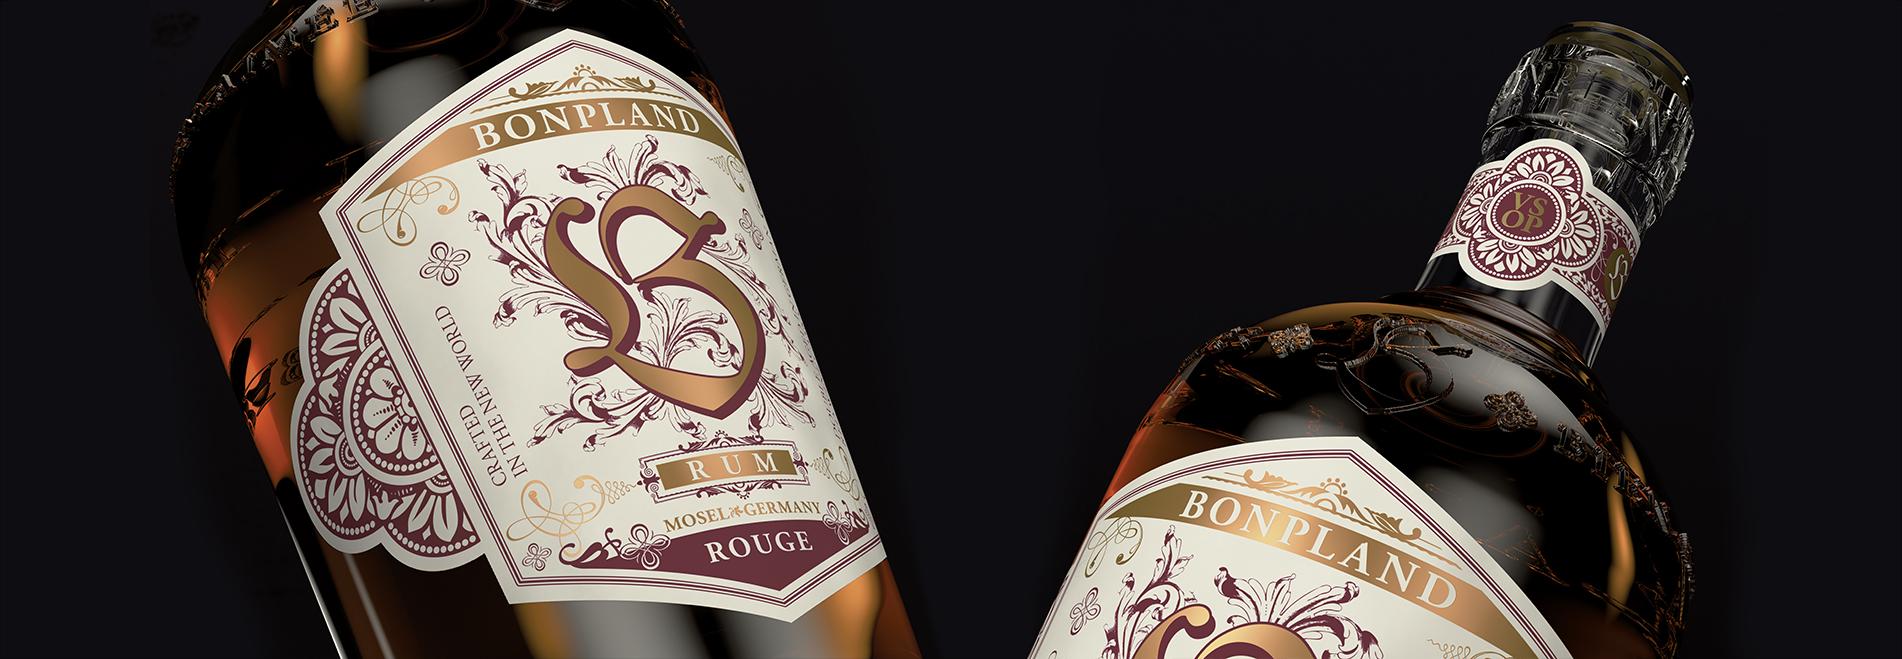 Two details shots of the Bonpland Rum Rouge bottle